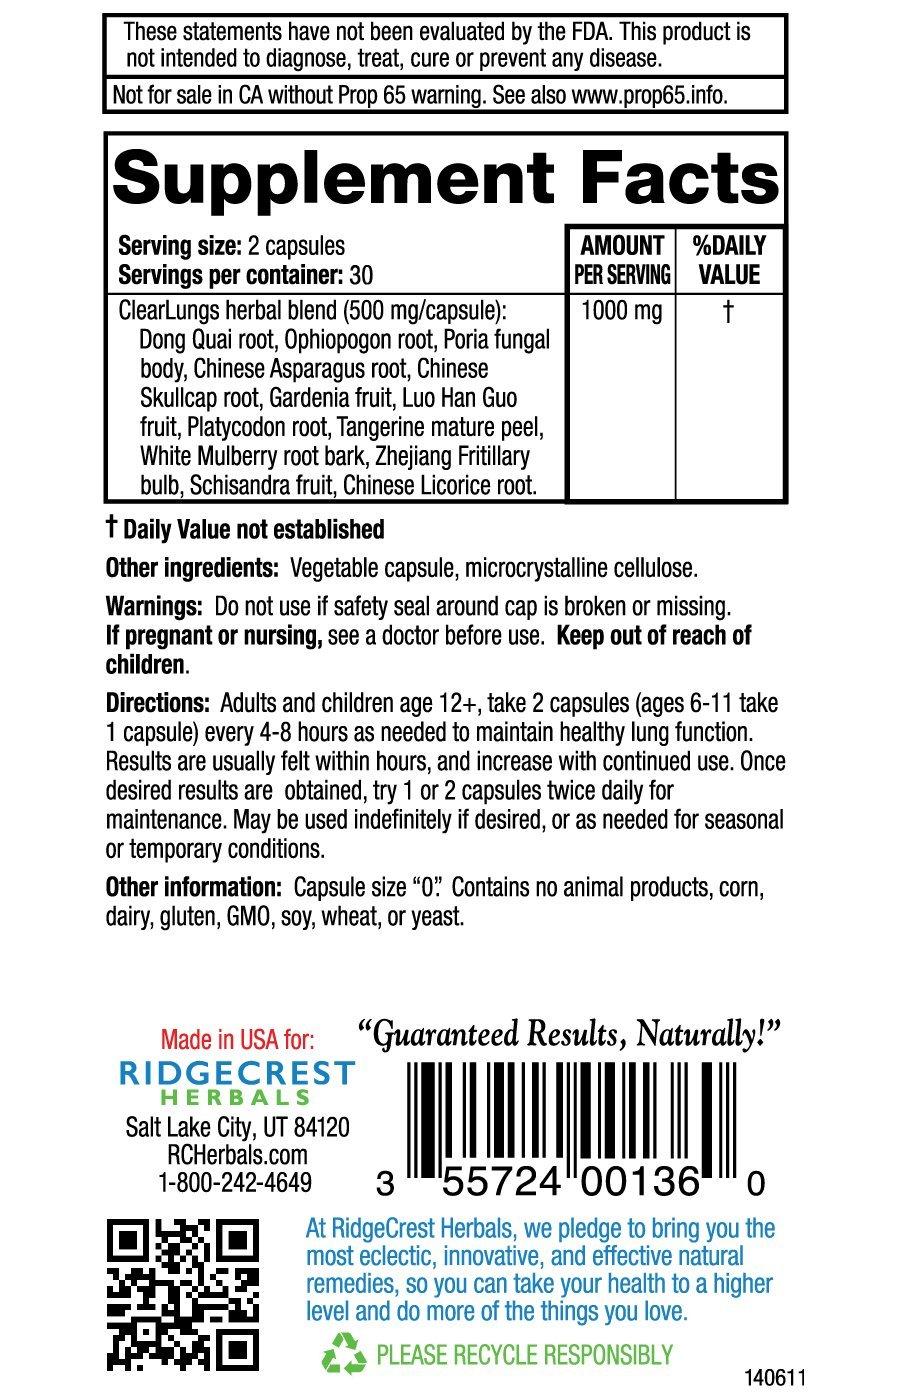 Amazon.com: Ridgecrest Herbal clearlungs clásico etiqueta ...